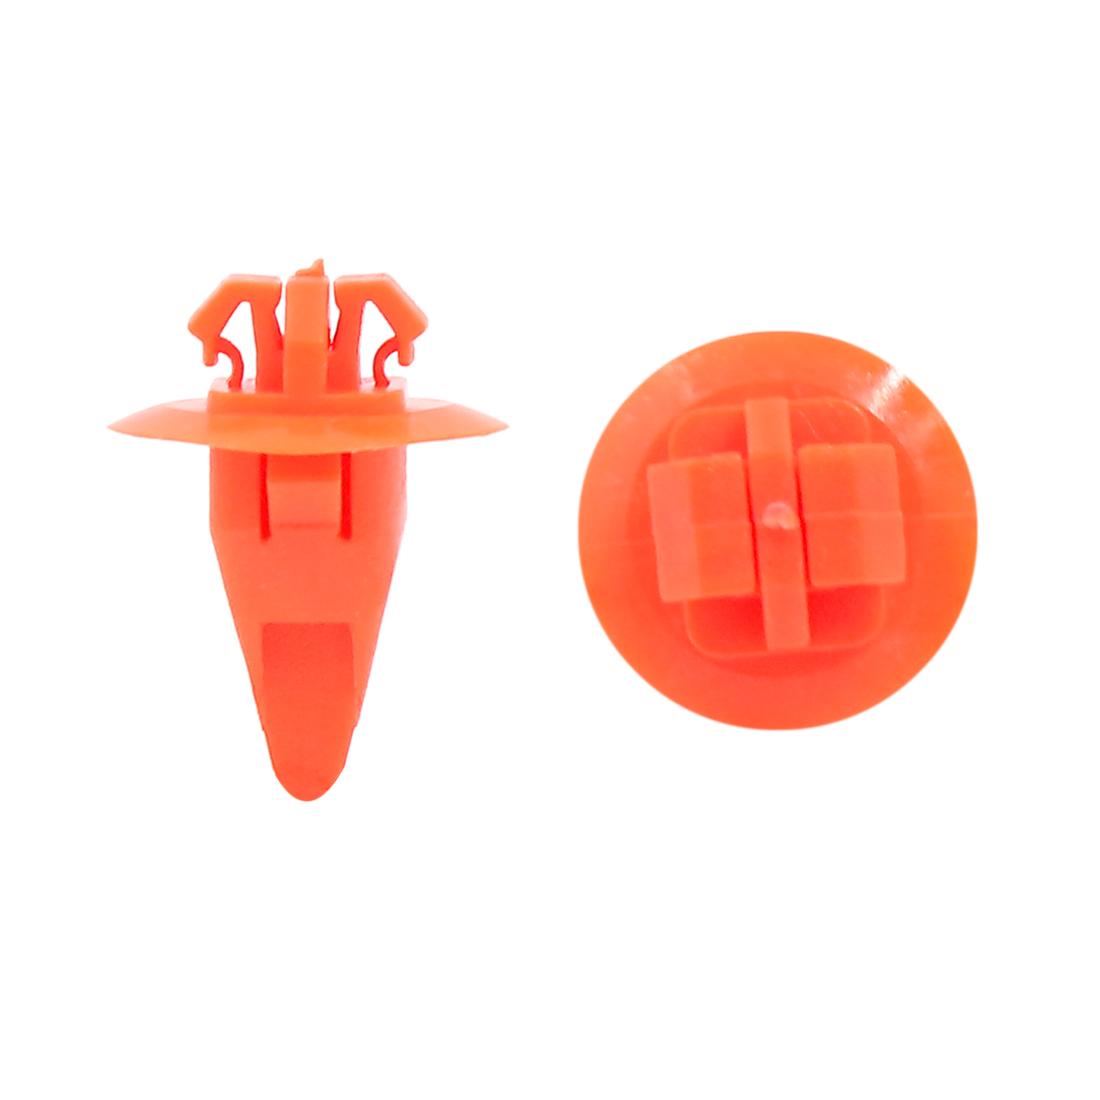 40Pcs Orange Plastic Rivets Bumper Fender Clips Arch Mouldings Fastener 8 x 10mm